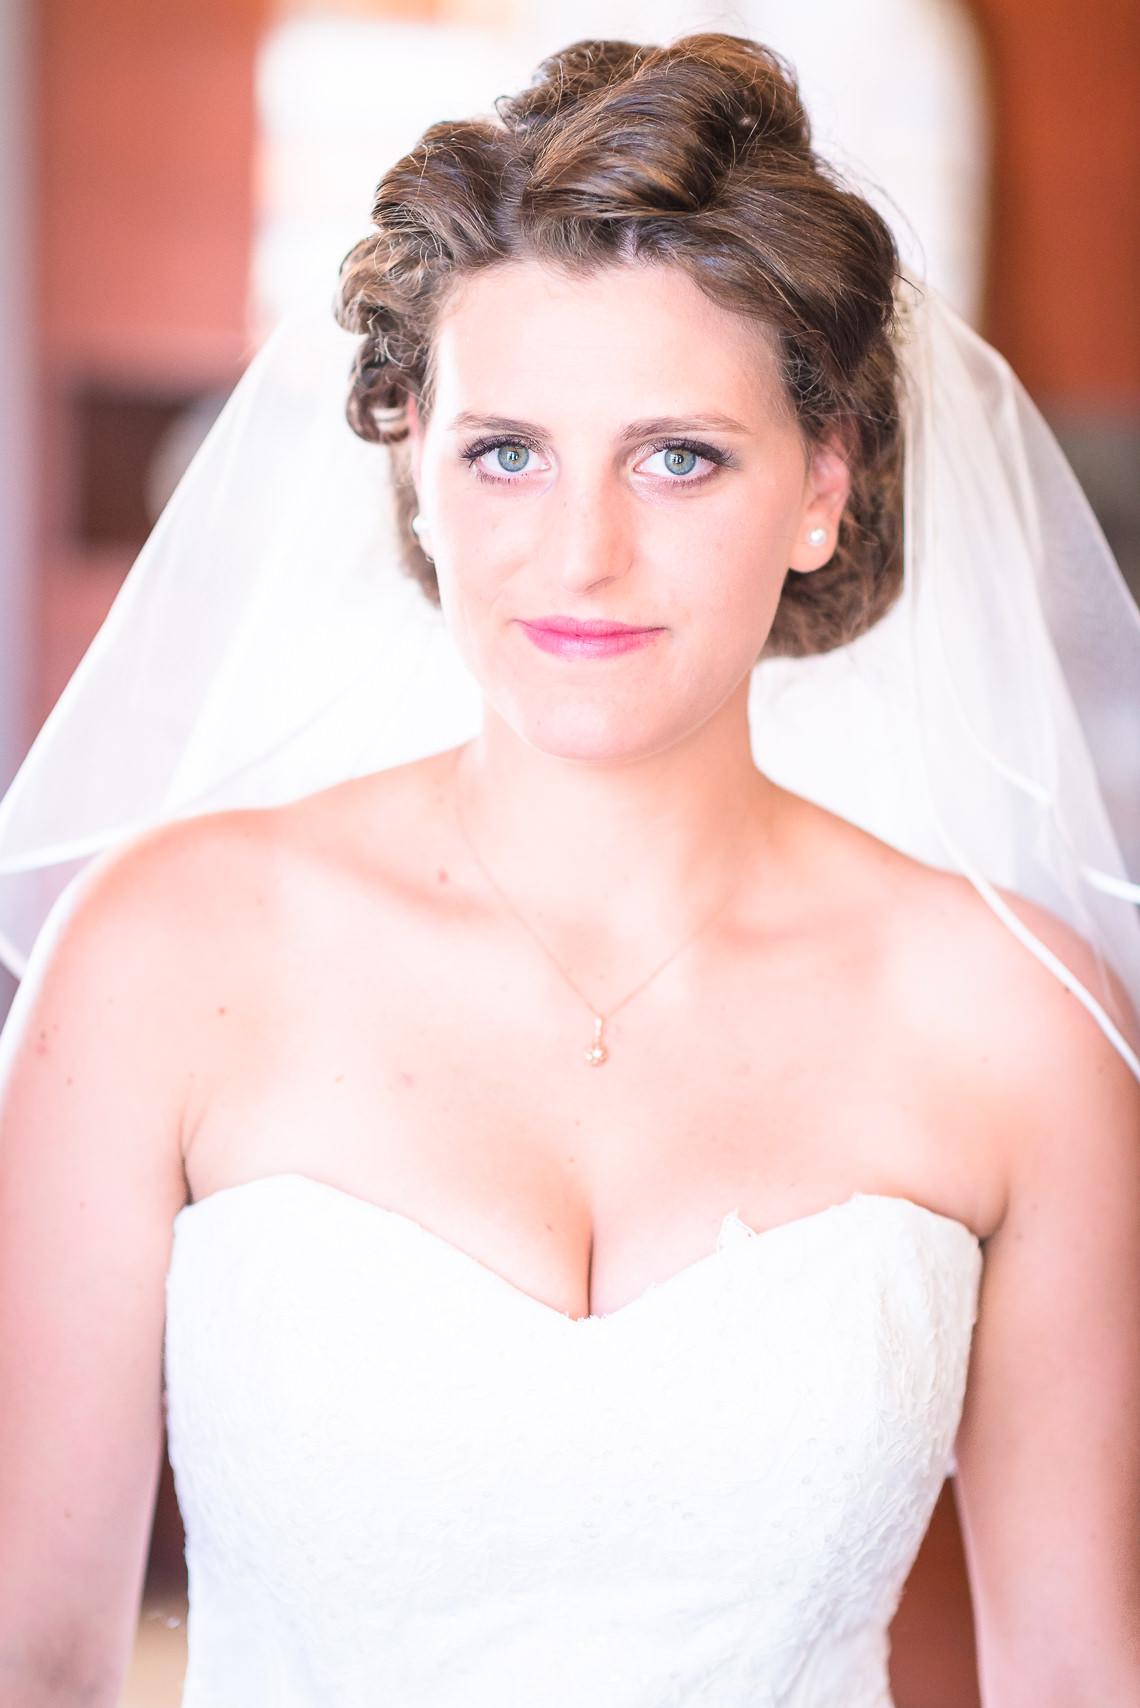 0023_20150905_CKE_3231_Hochzeit_Michaela_Andreas_